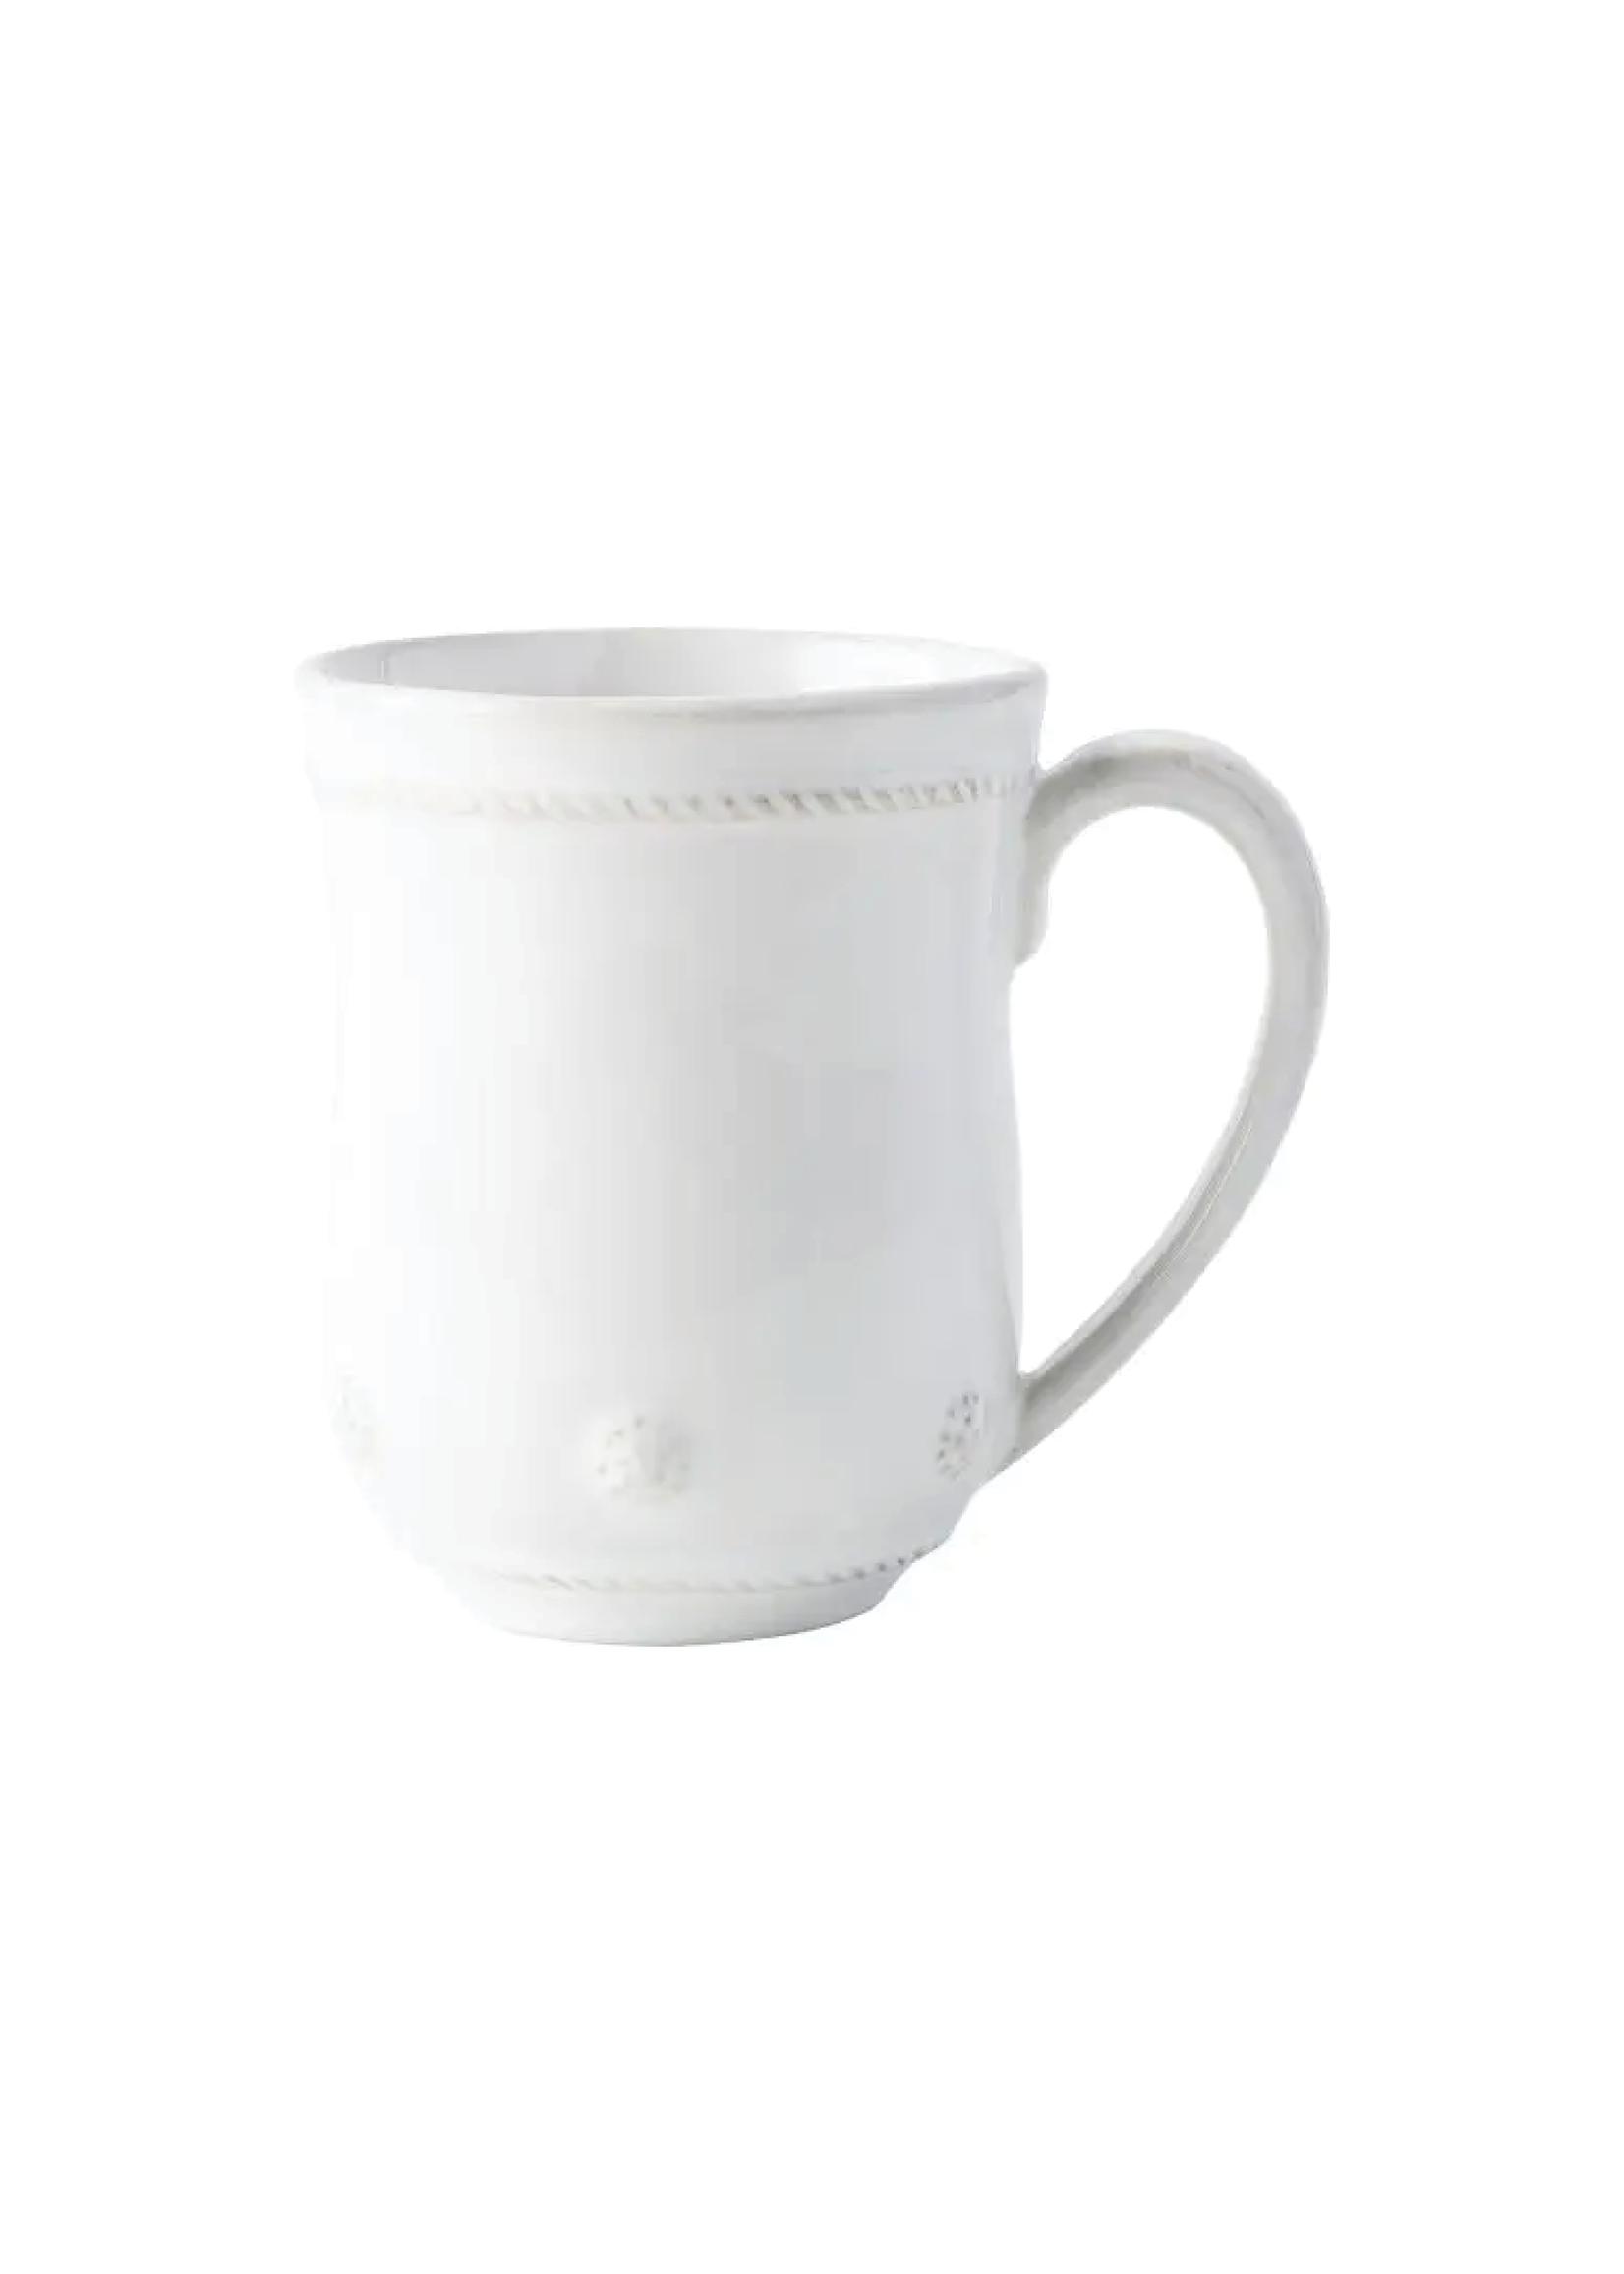 Juliska Berry & Thread Flared Mug, White